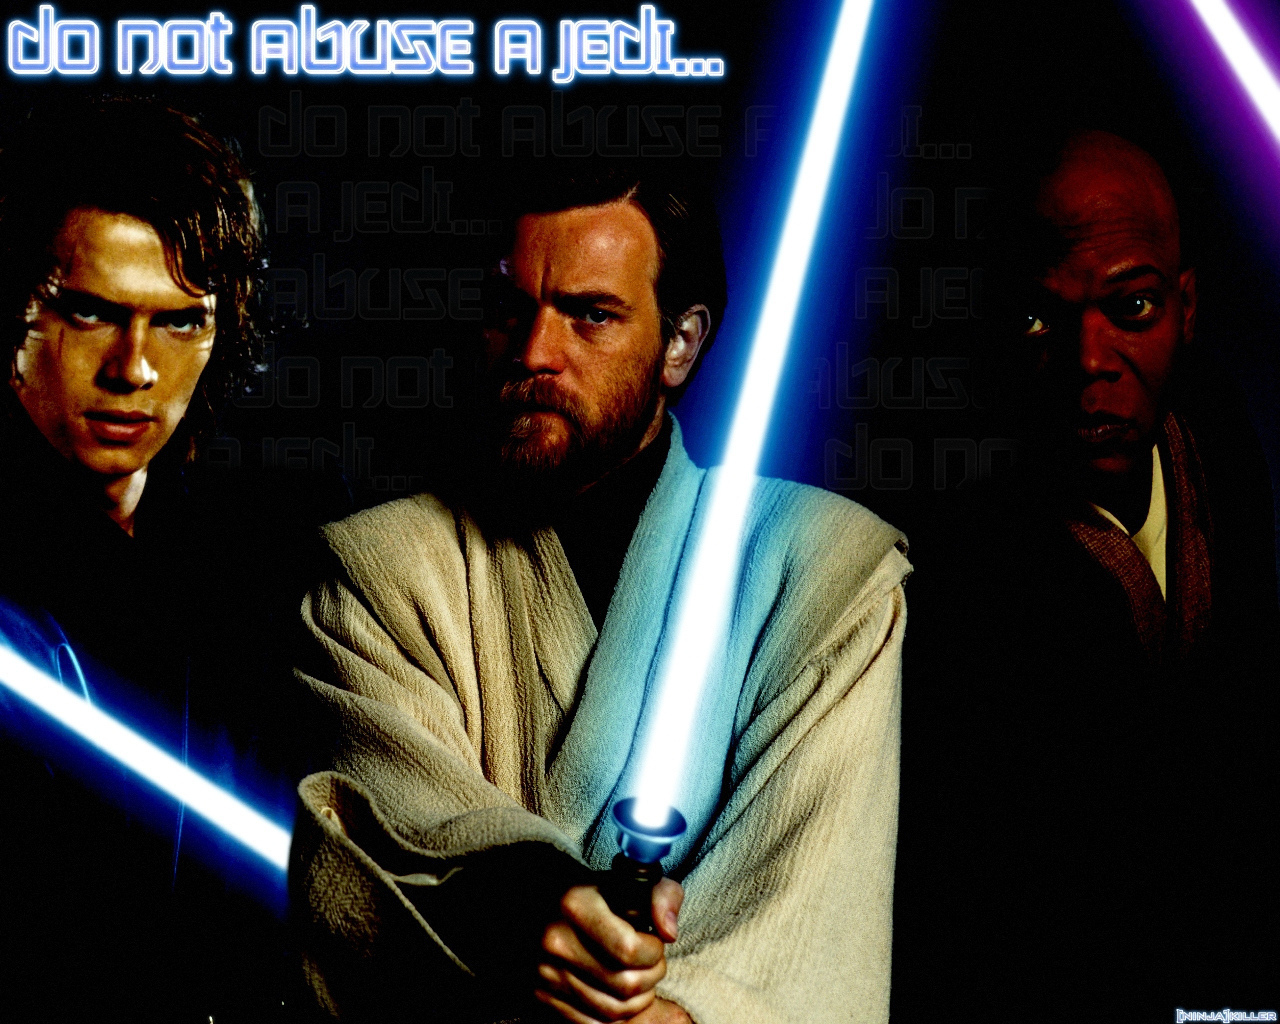 Anakin Obi Wan Kenobi And Mace Windu Action Film 1249114 Hd